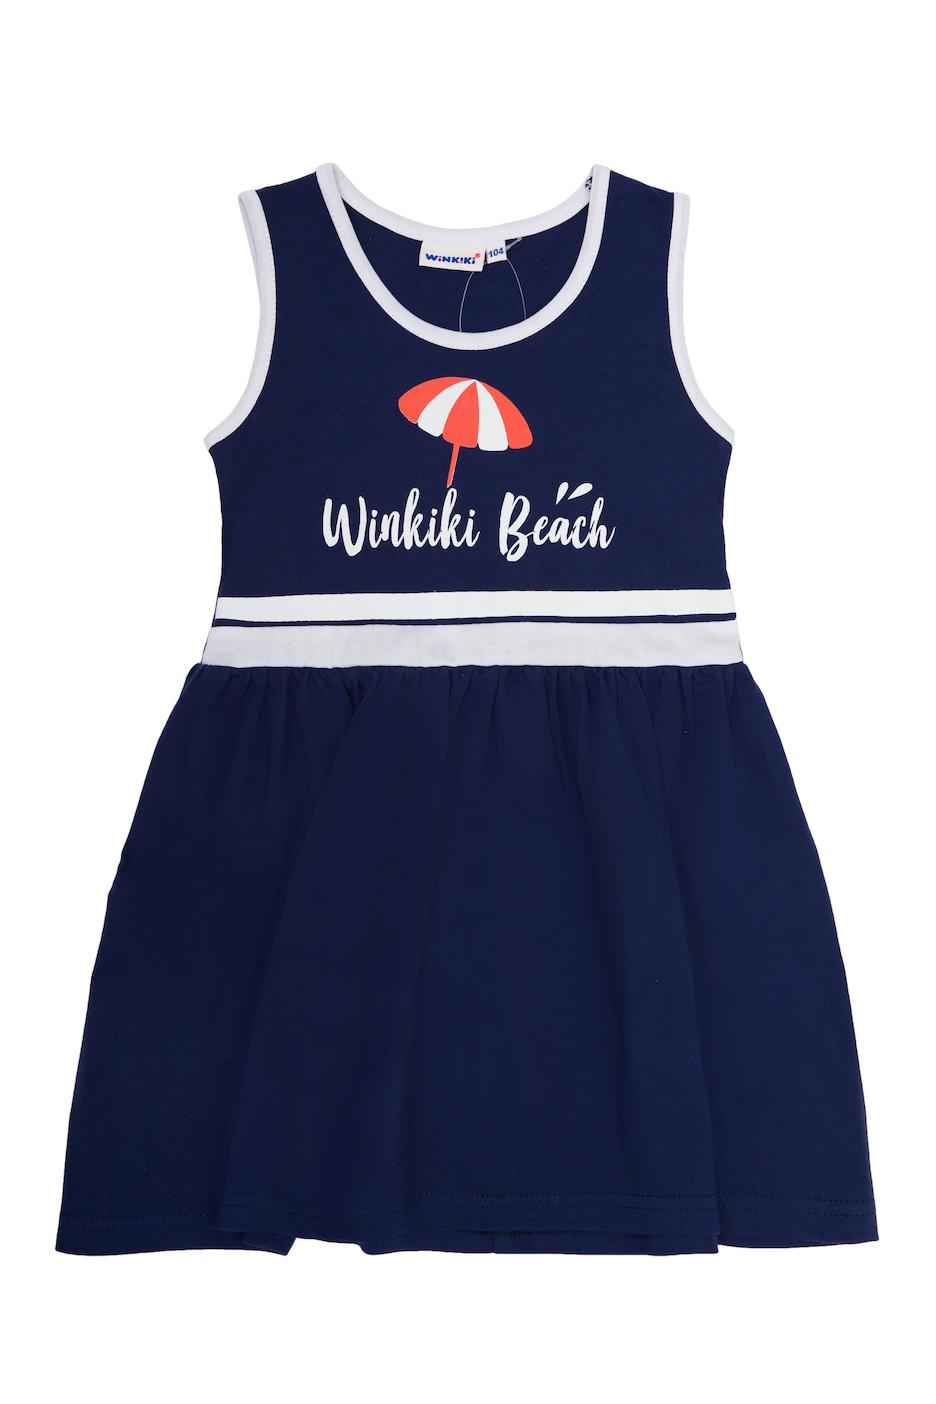 Dívčí šaty Winkiki Beach Navy